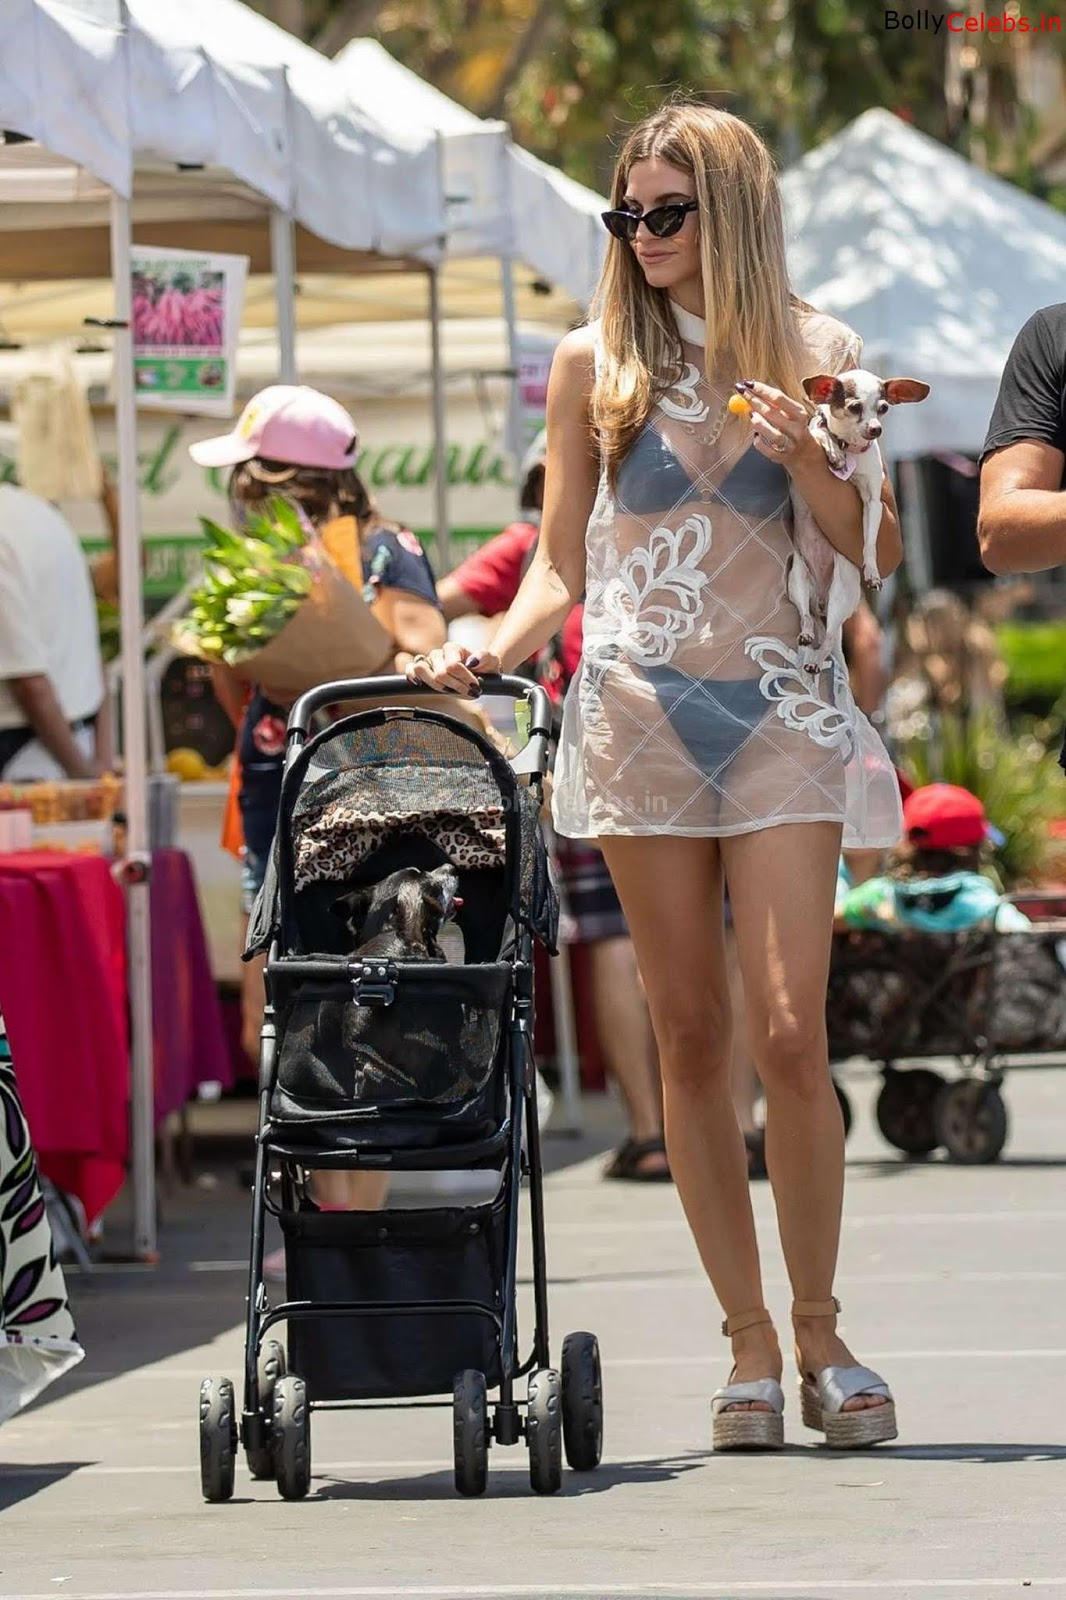 Rachel Mccord Exposing her Bra panties in transparent gown WOW